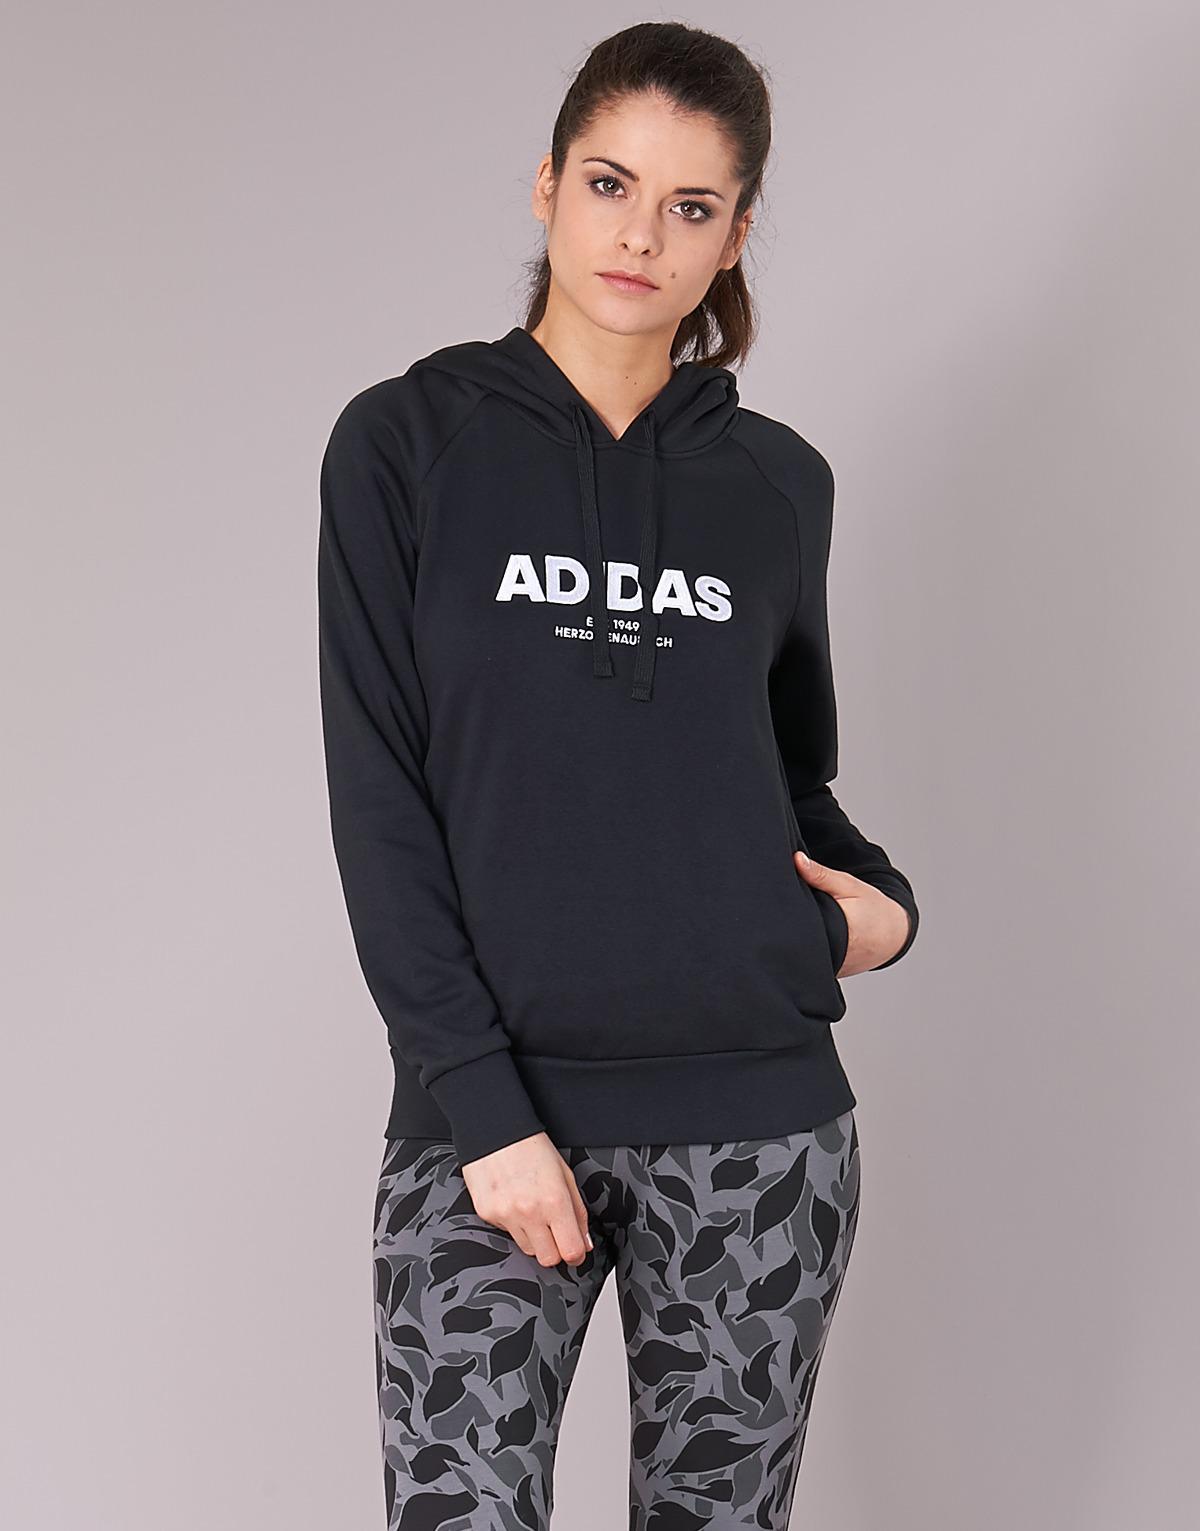 adidas Ess Allcap Oh H Sweatshirt in Black - Save 10% - Lyst 04f5a21ce65